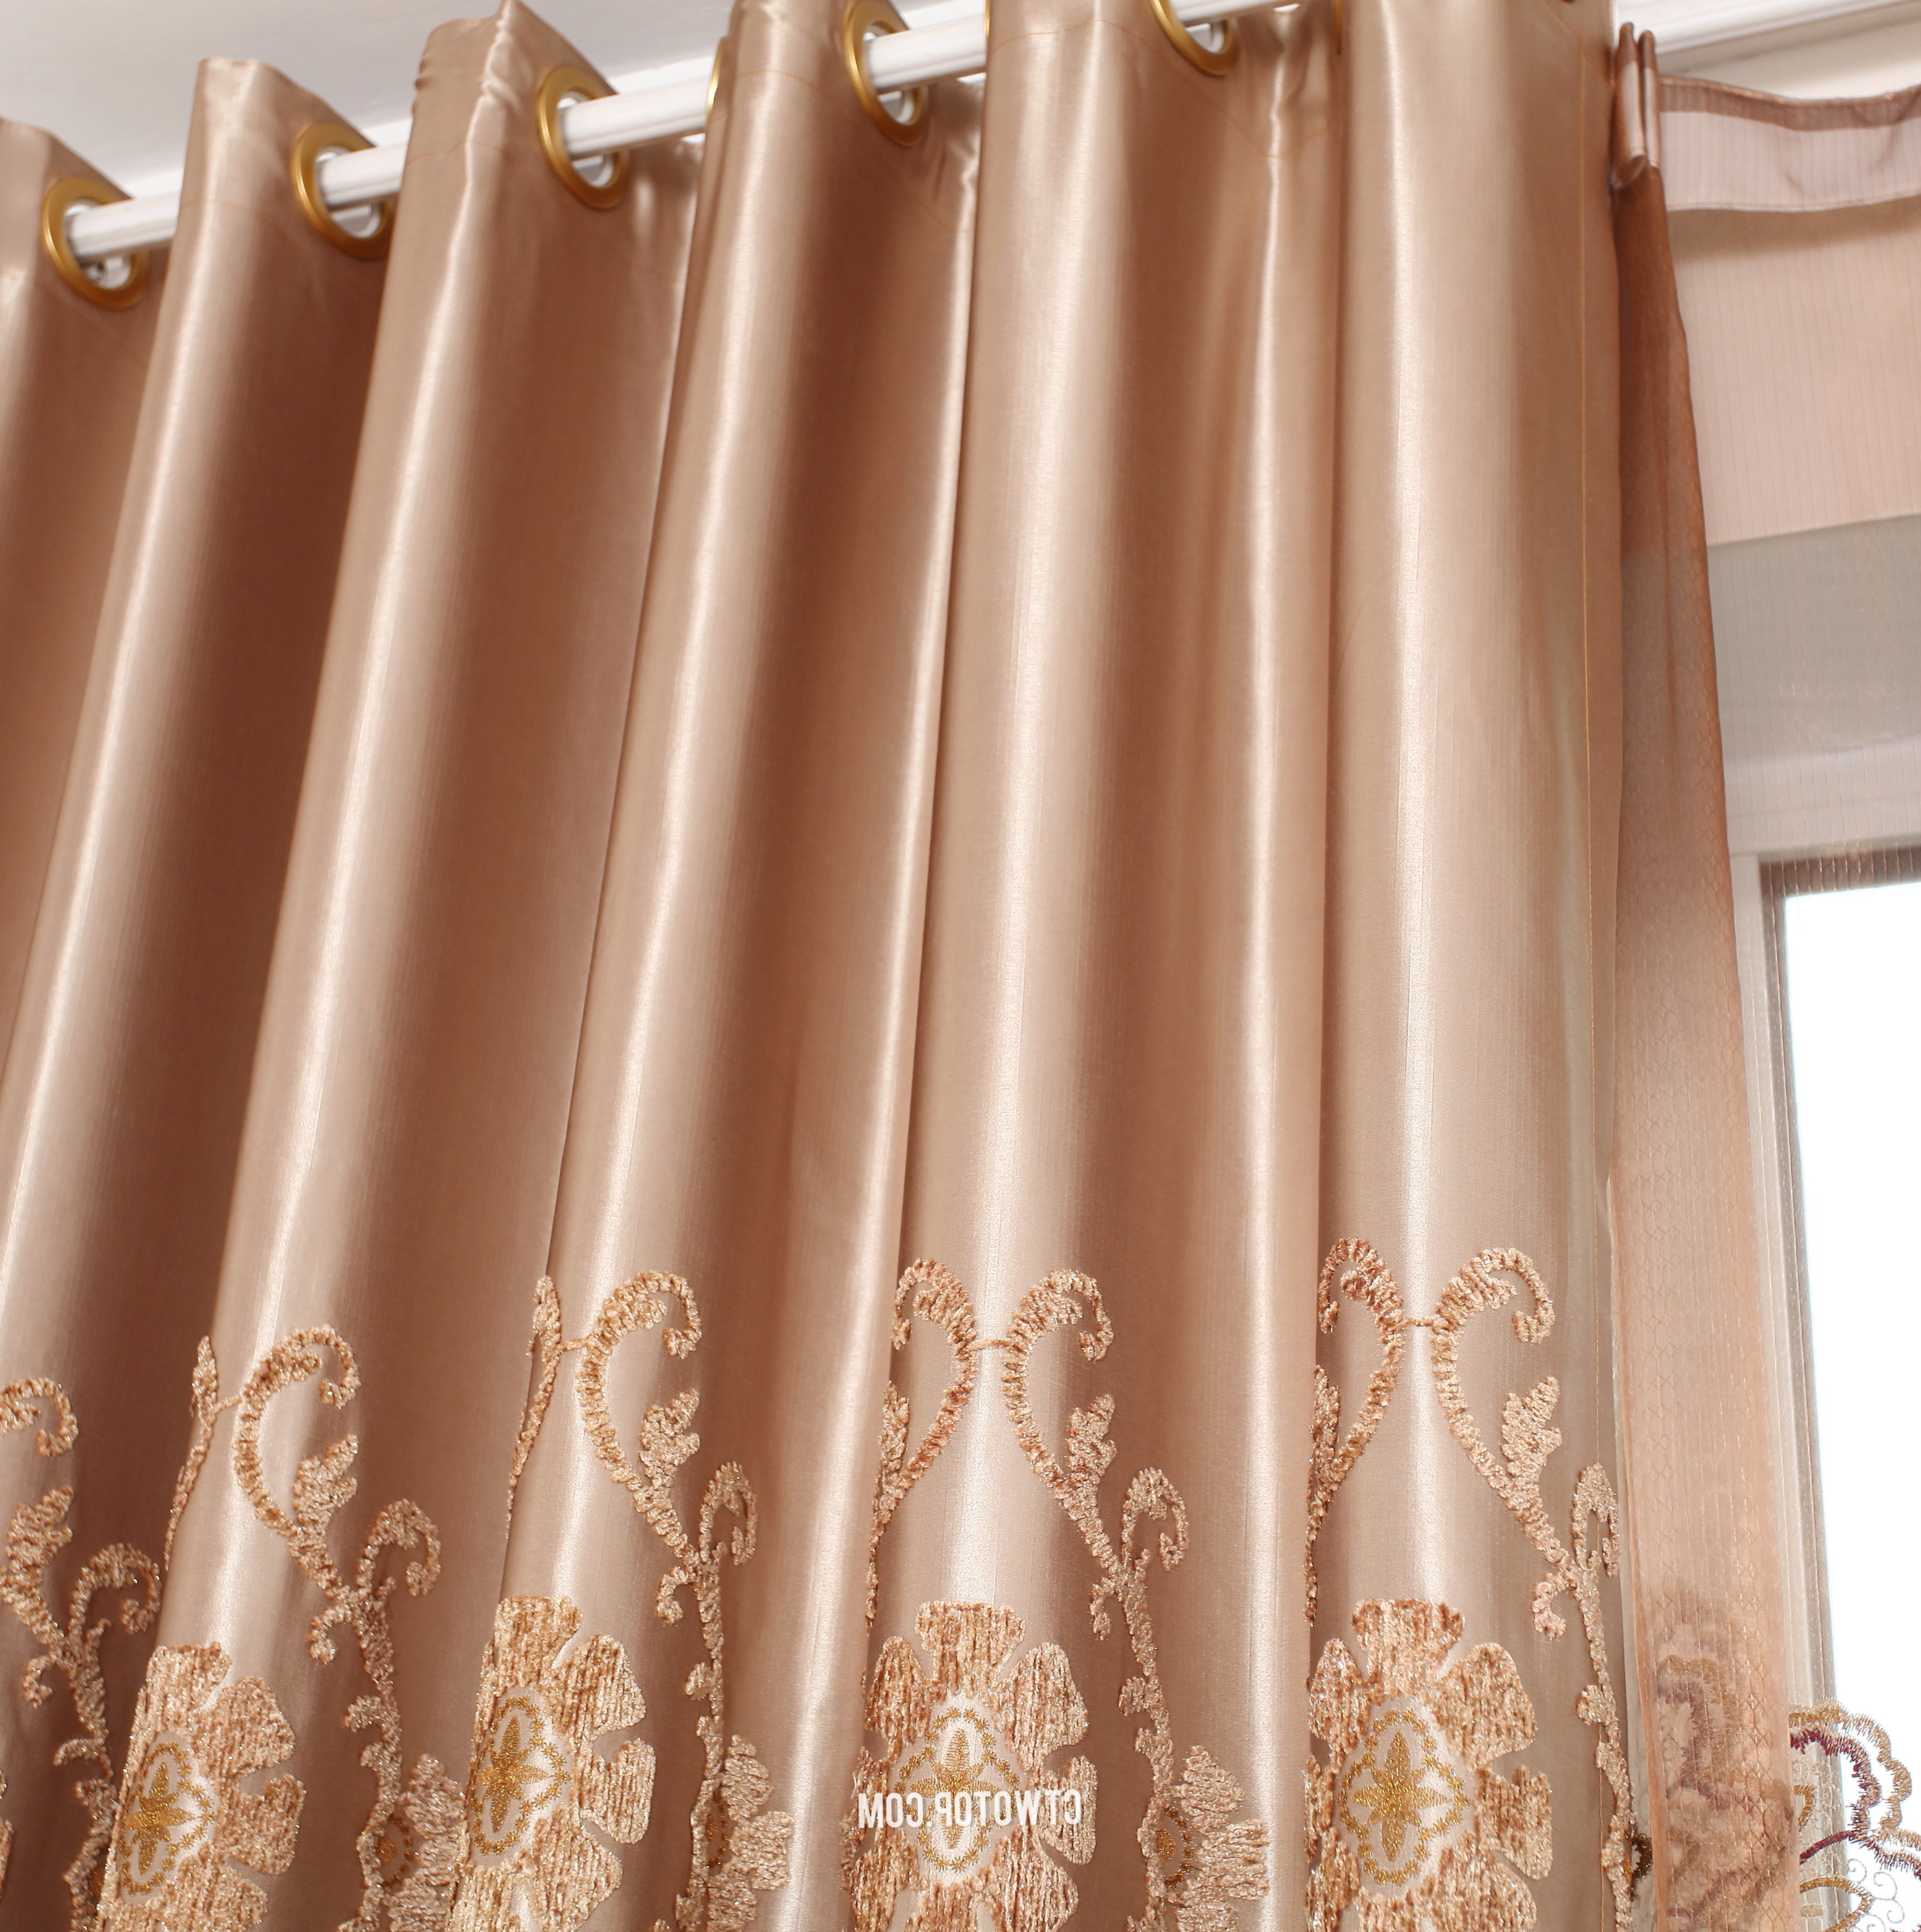 sound dampening curtains amazon home design ideas. Black Bedroom Furniture Sets. Home Design Ideas